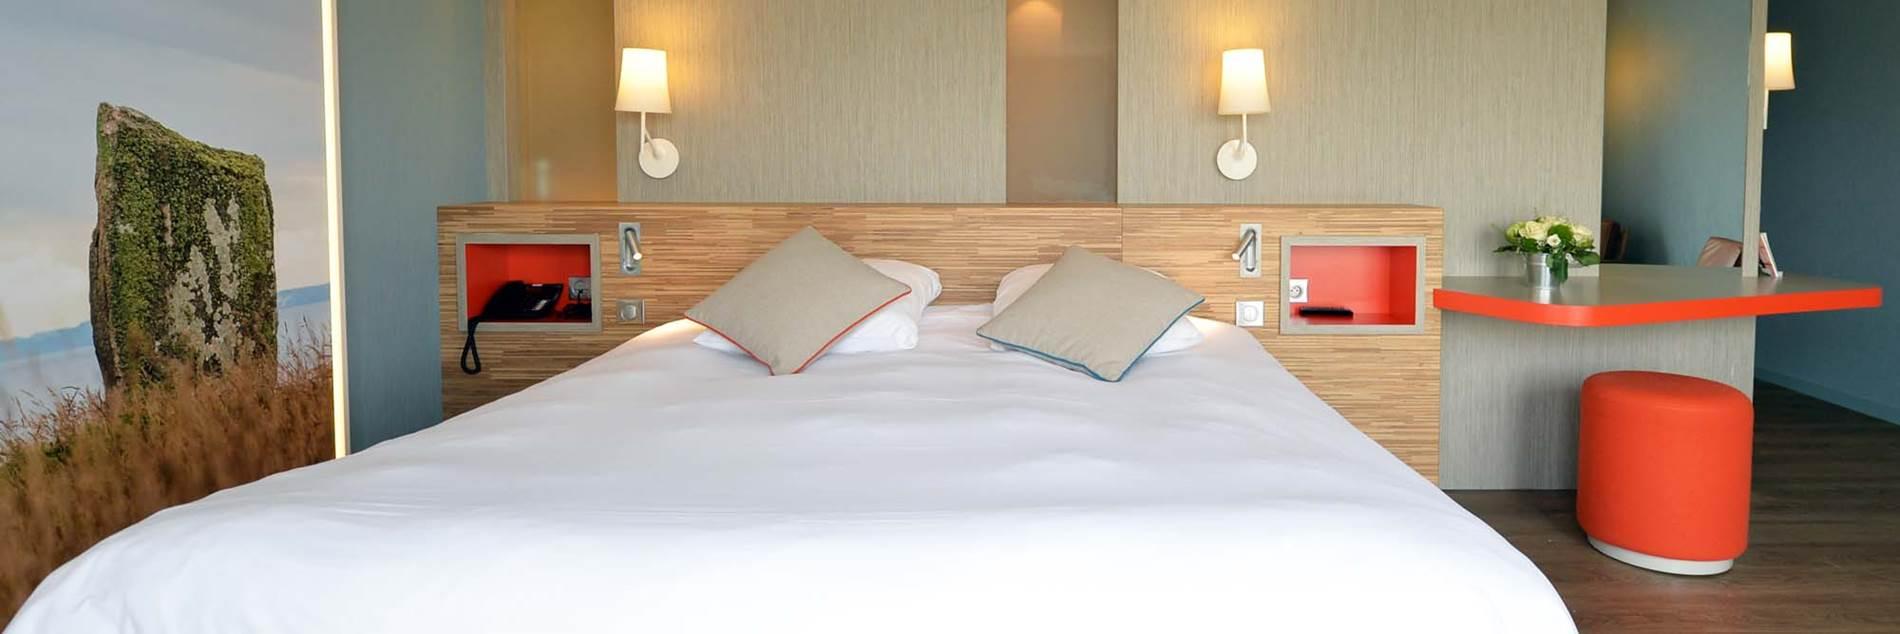 Thalazur-Carnac-Hotel-Les-Salines-Chambre-Morbihan-Bretagne-Sud © Michel RENAC